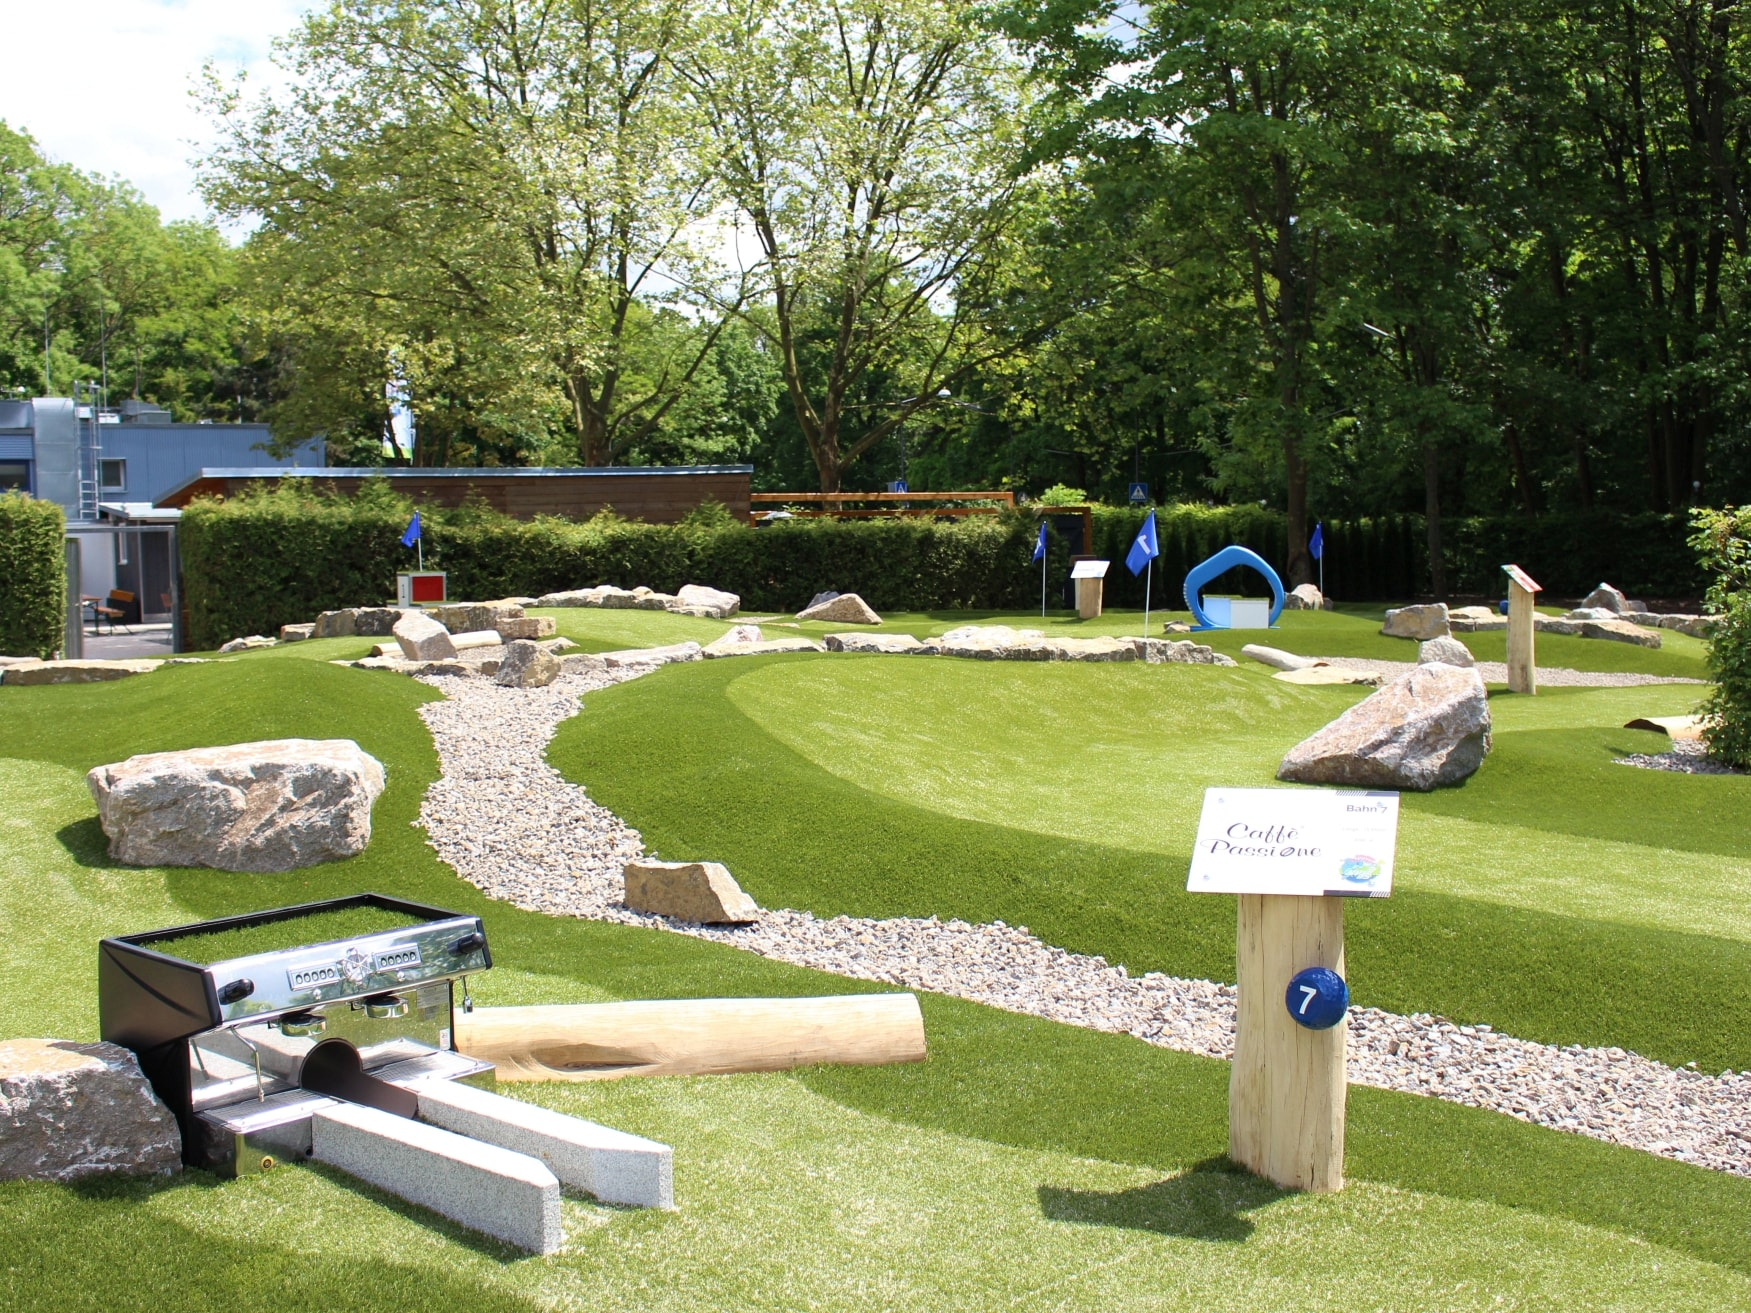 golfpark würzburg SVW 05, Minigolf,